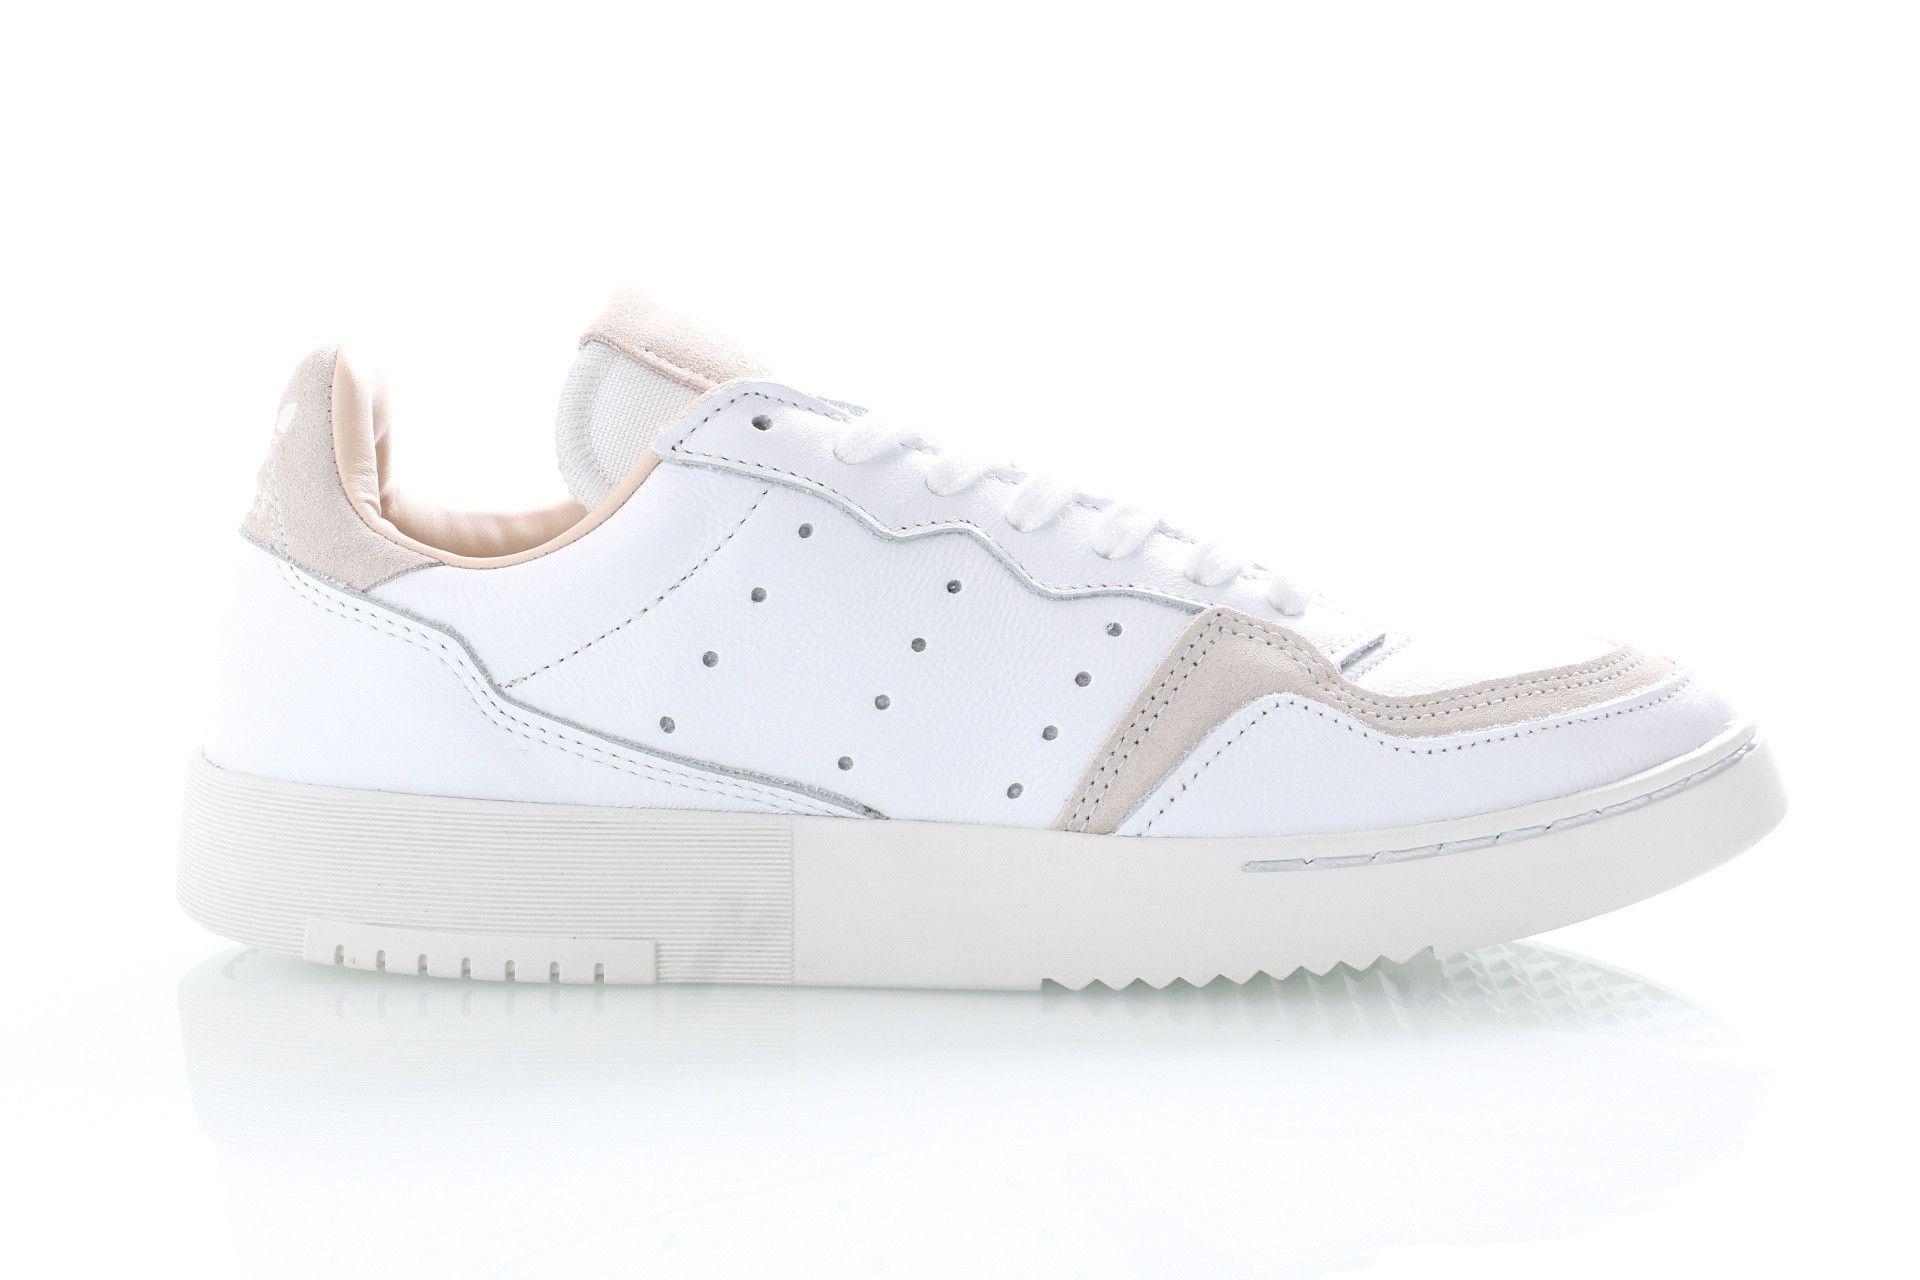 Afbeelding van Adidas Supercourt Ee6034 Sneakers Ftwwht/Ftwwht/Crywht